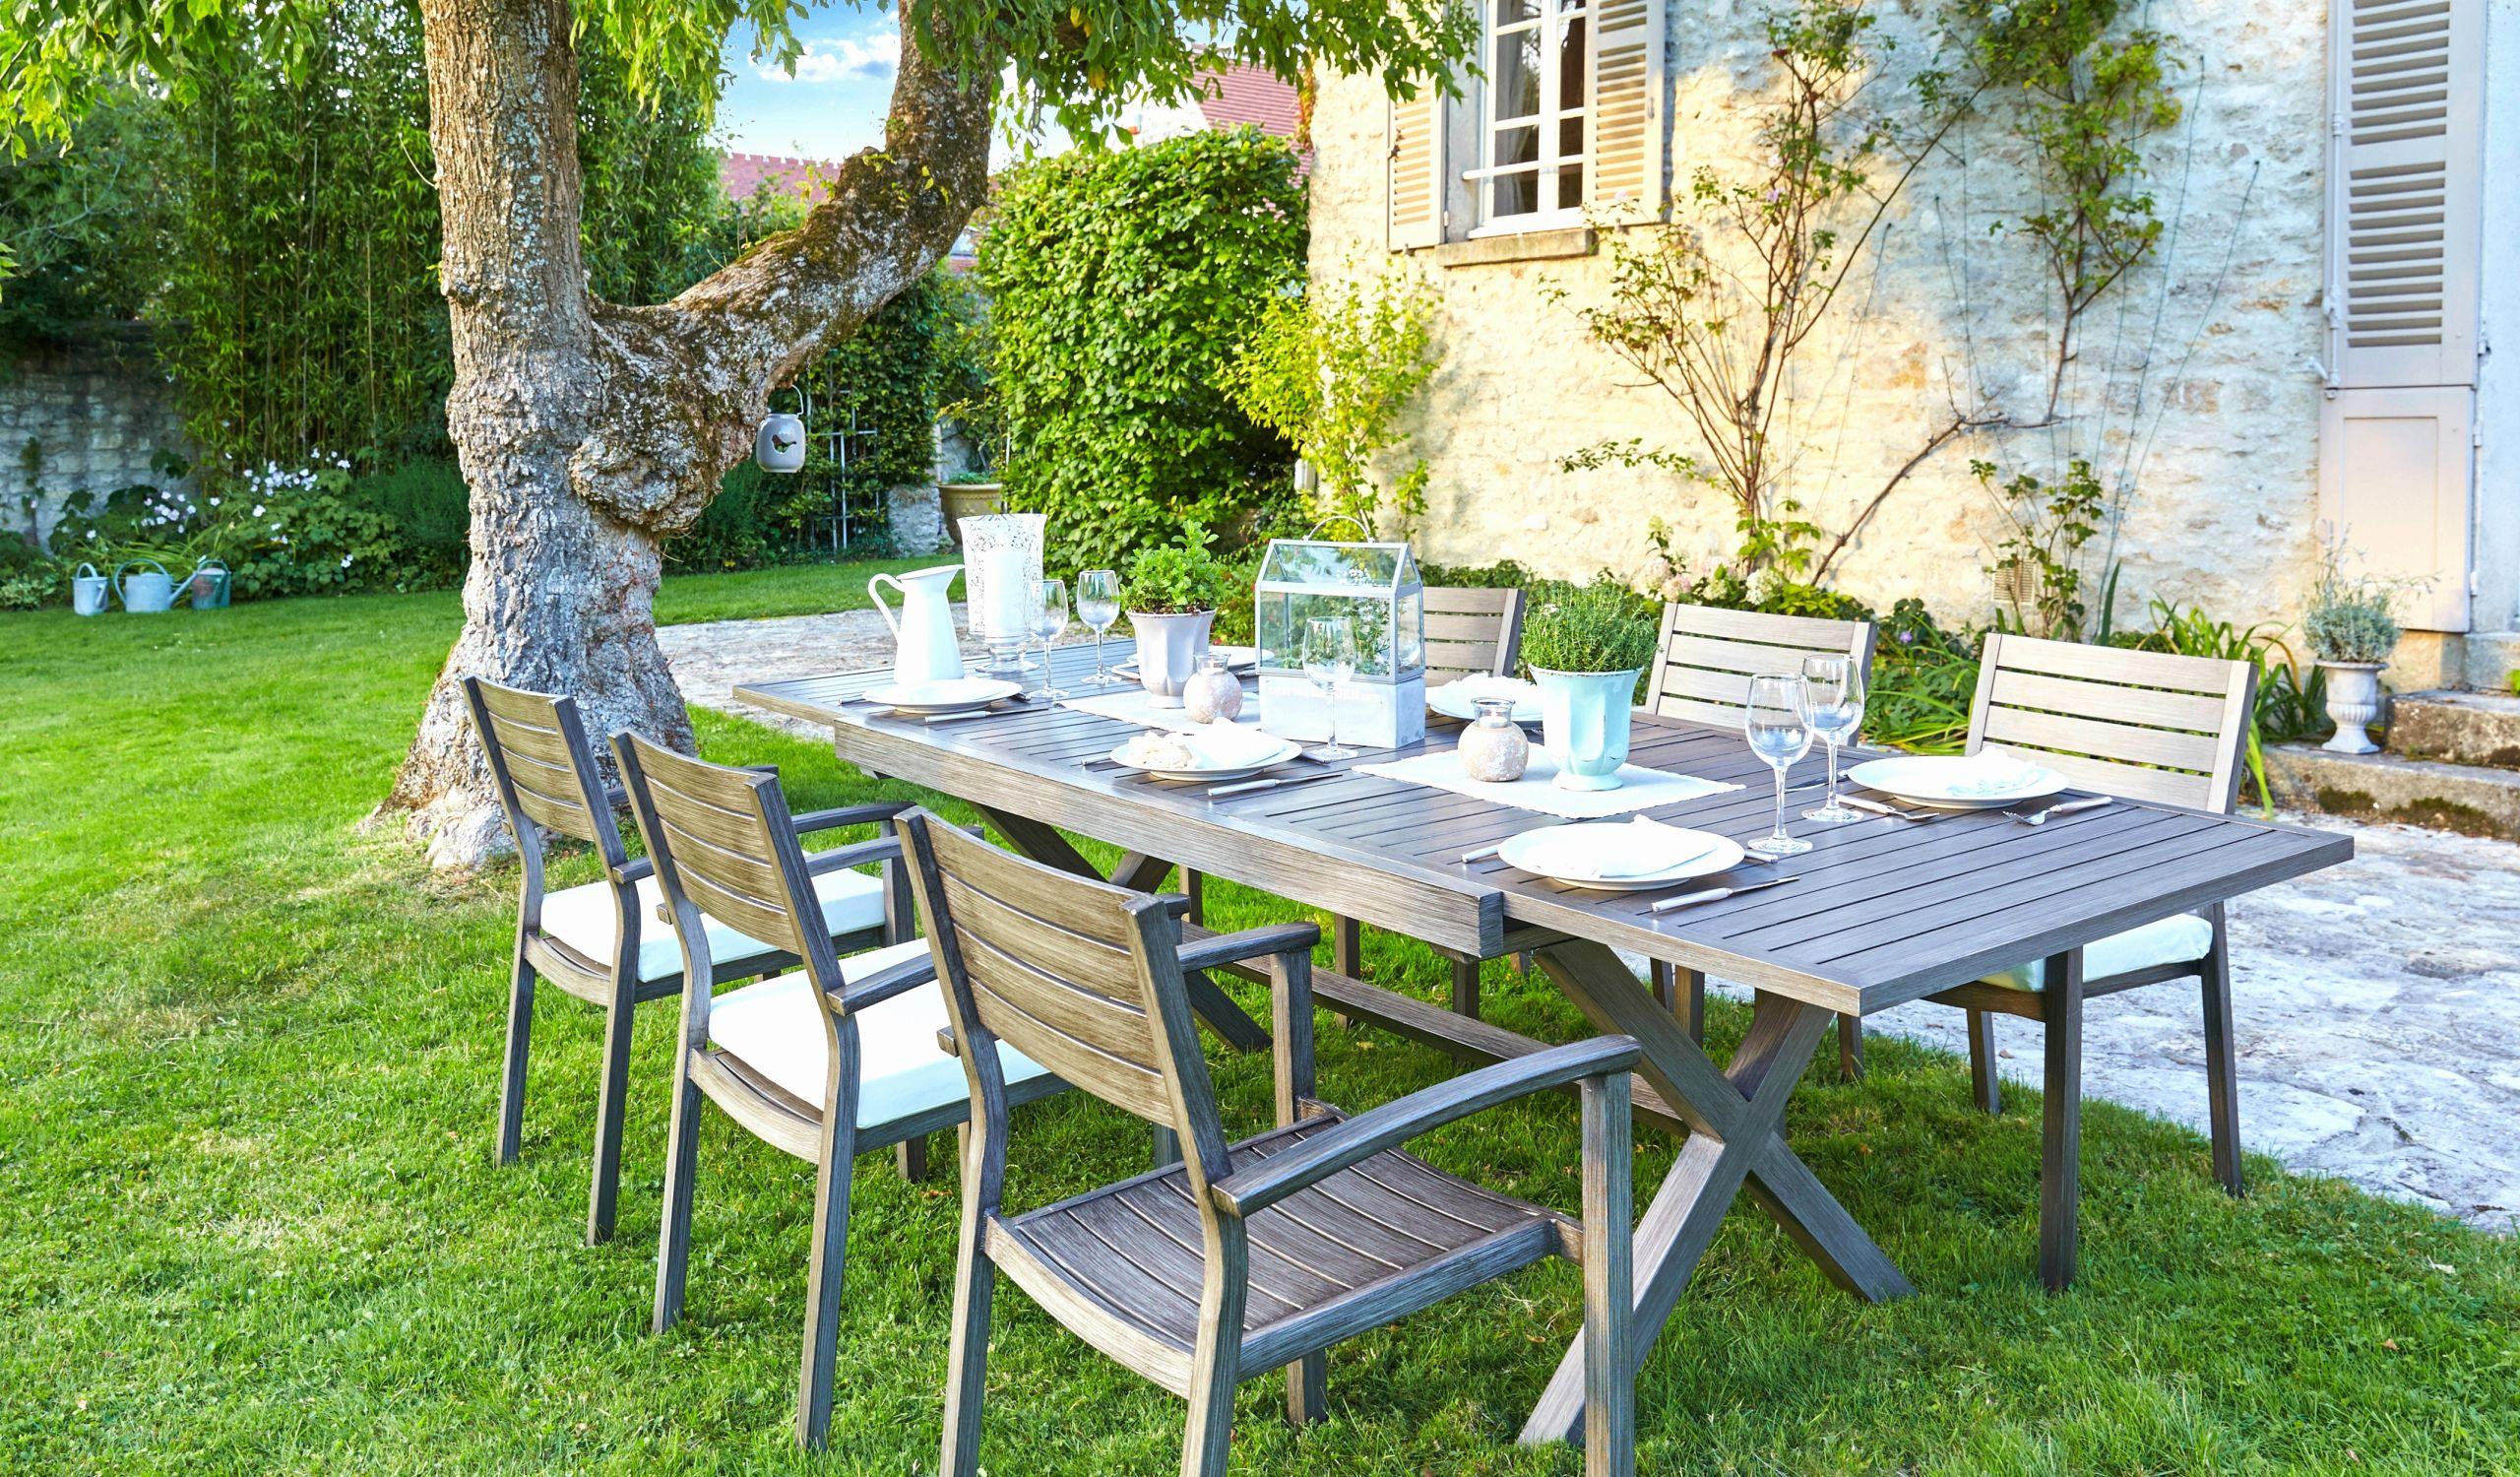 table basse fermob impressionnant table basse jardin ikea inspirant salon table de salon ikea unique of table basse fermob